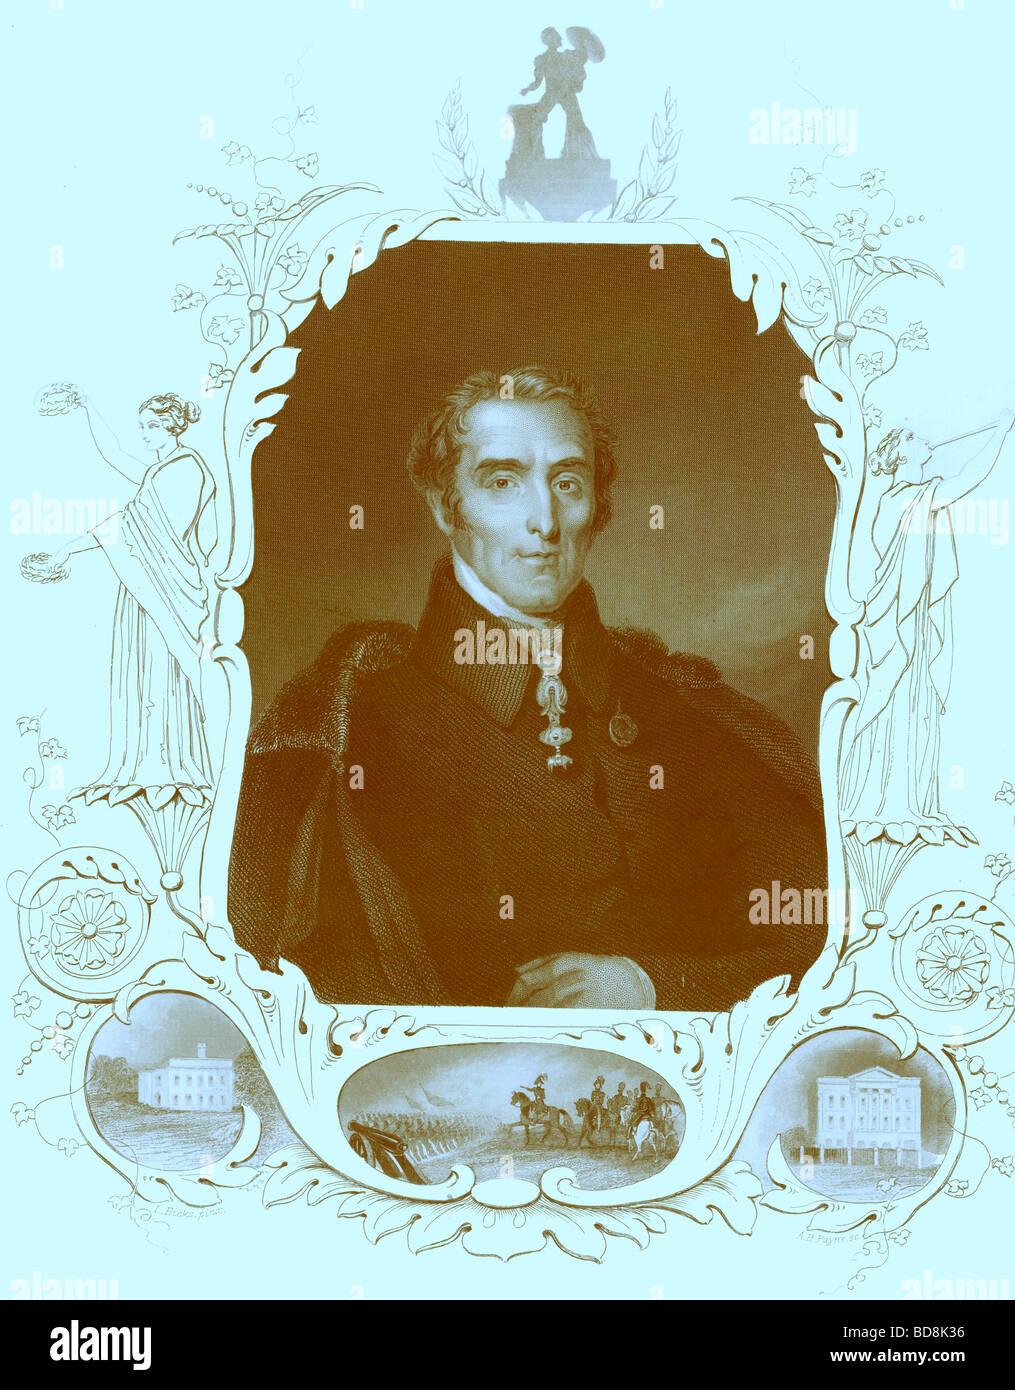 Duke of Wellington Payne s Universum 1847 - Stock Image